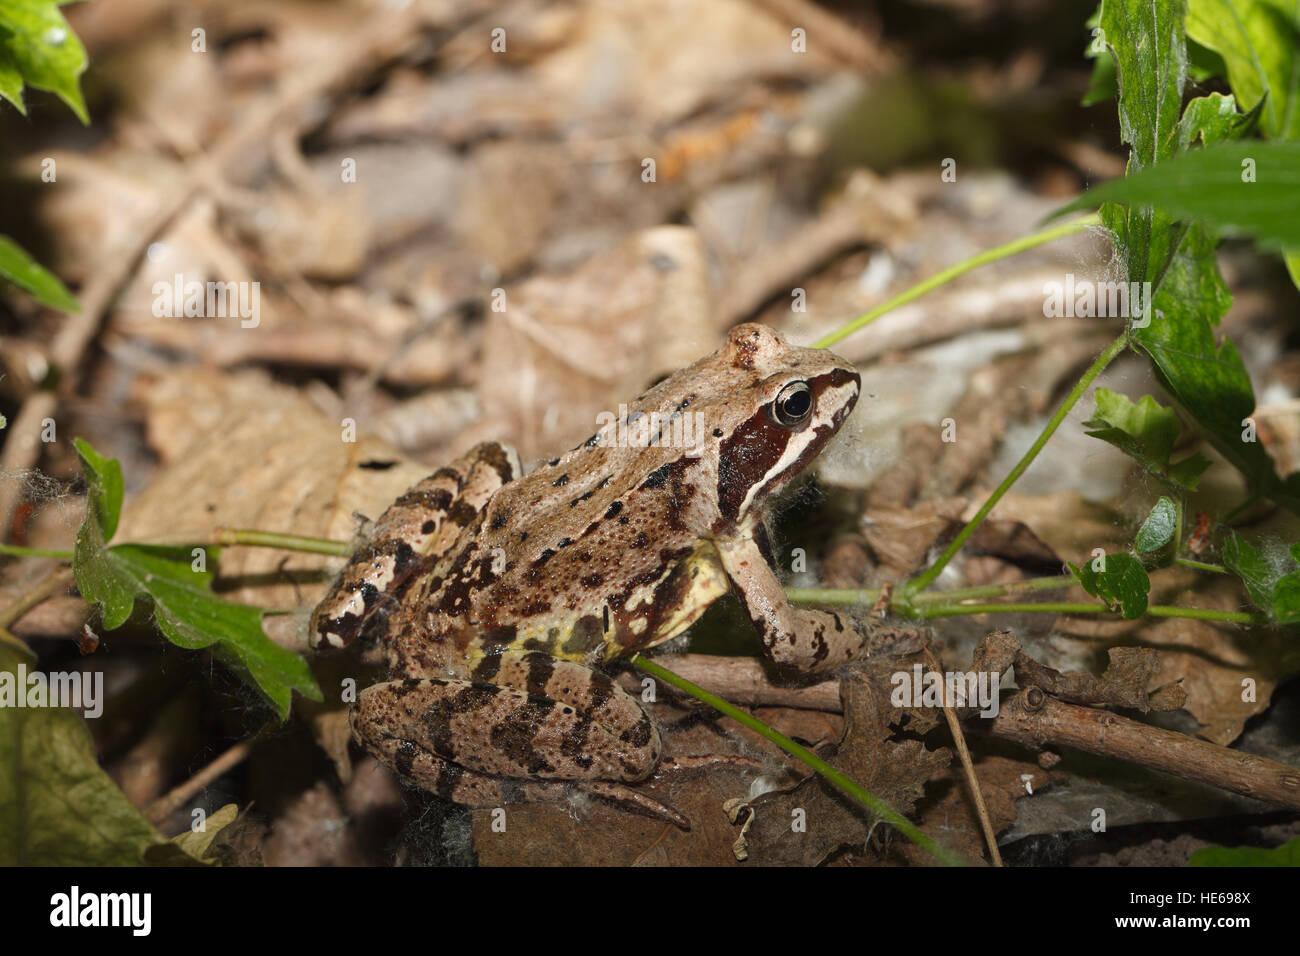 Rana temporaria frog closeup on the ground. horizontal - Stock Image